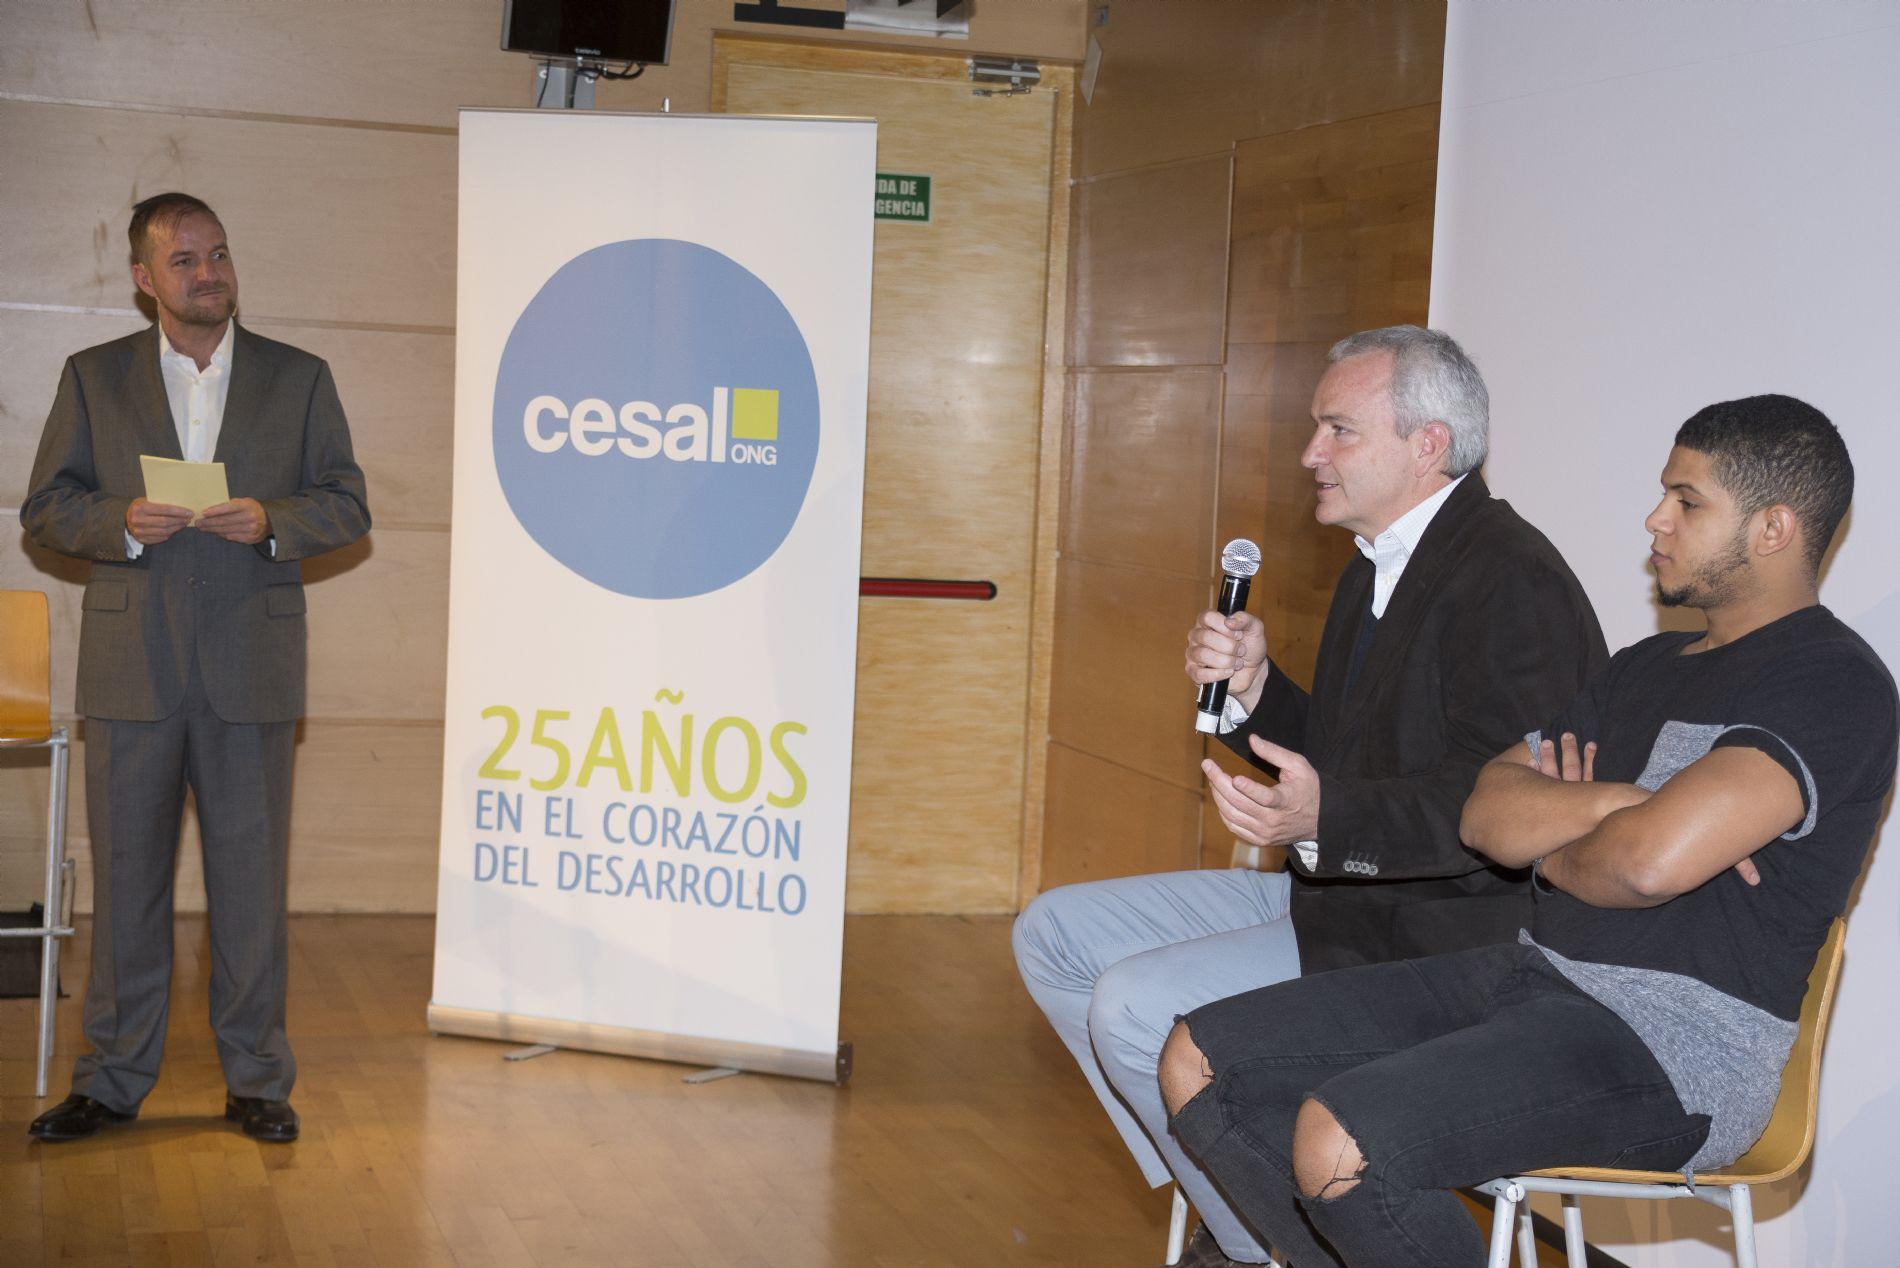 Ashraf Pablo Llano Jóvenes CESAL